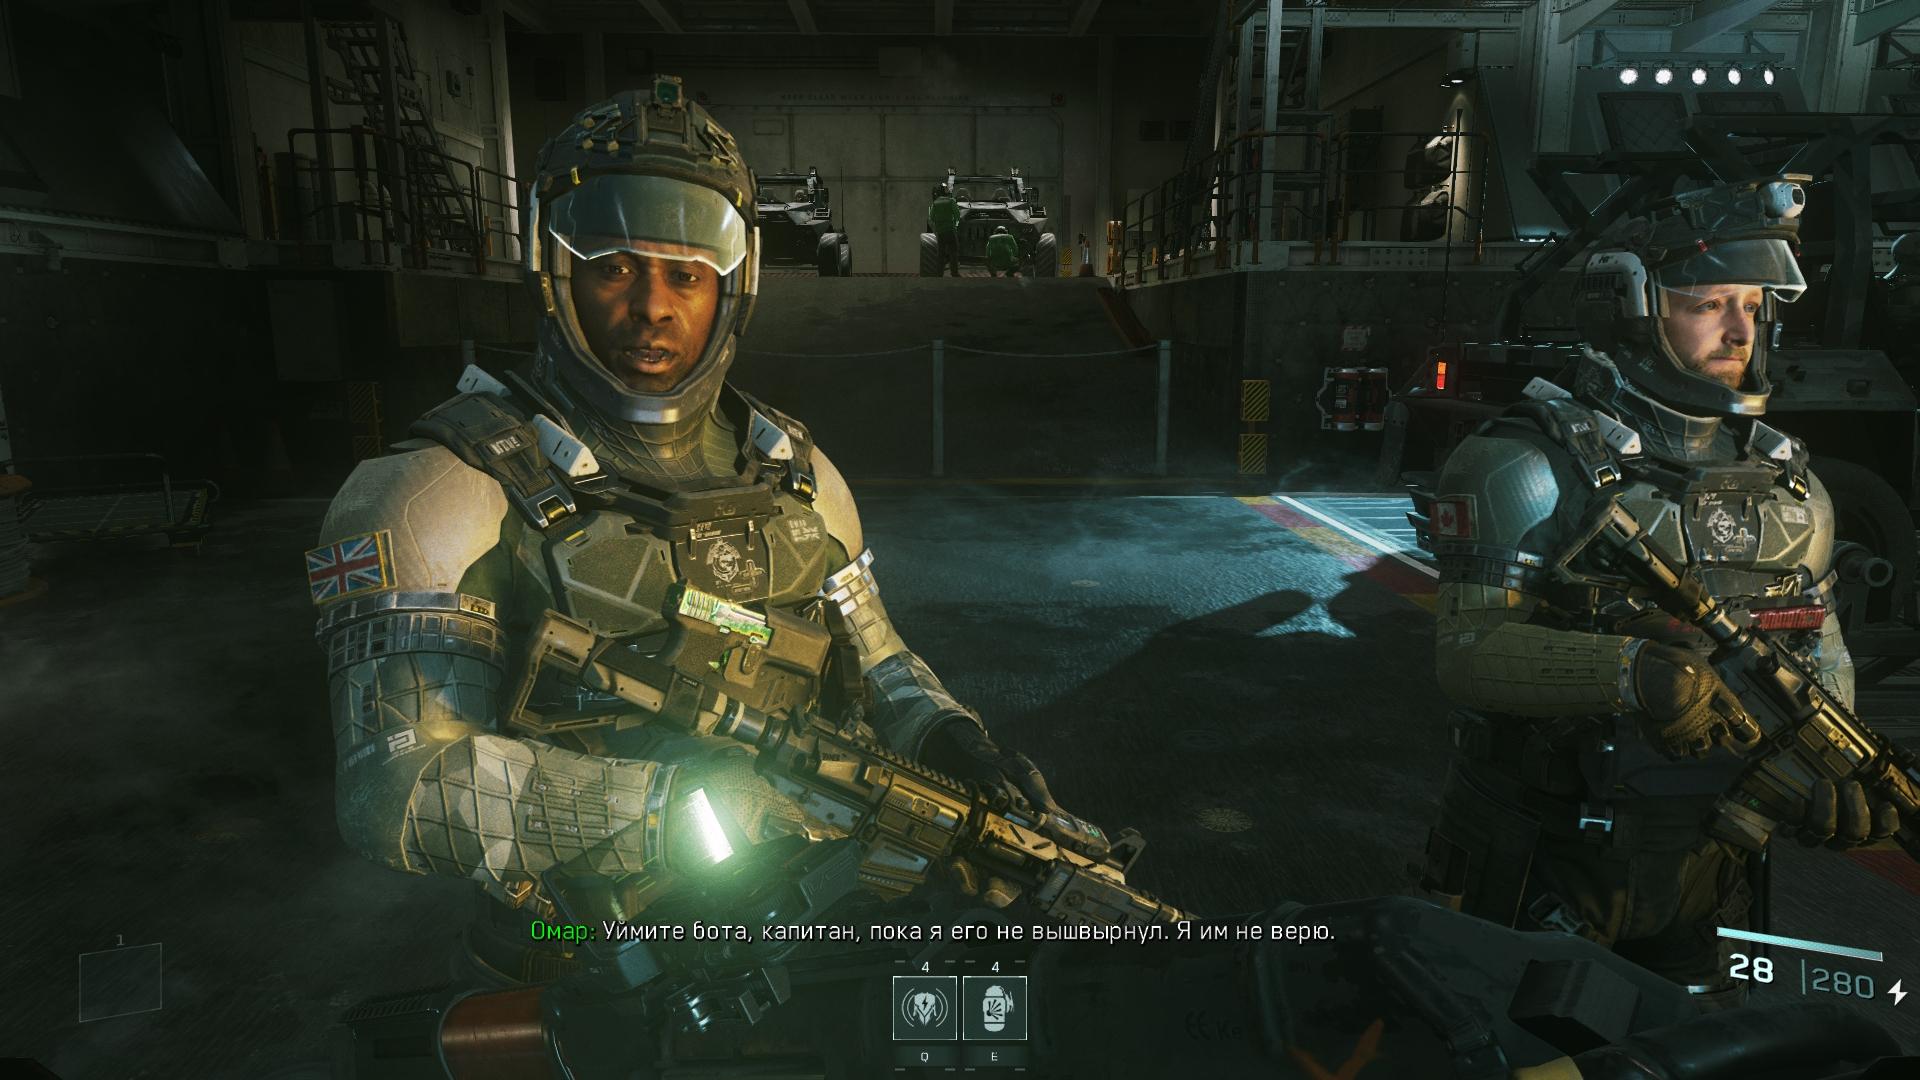 00034.Jpg - Call of Duty: Infinite Warfare